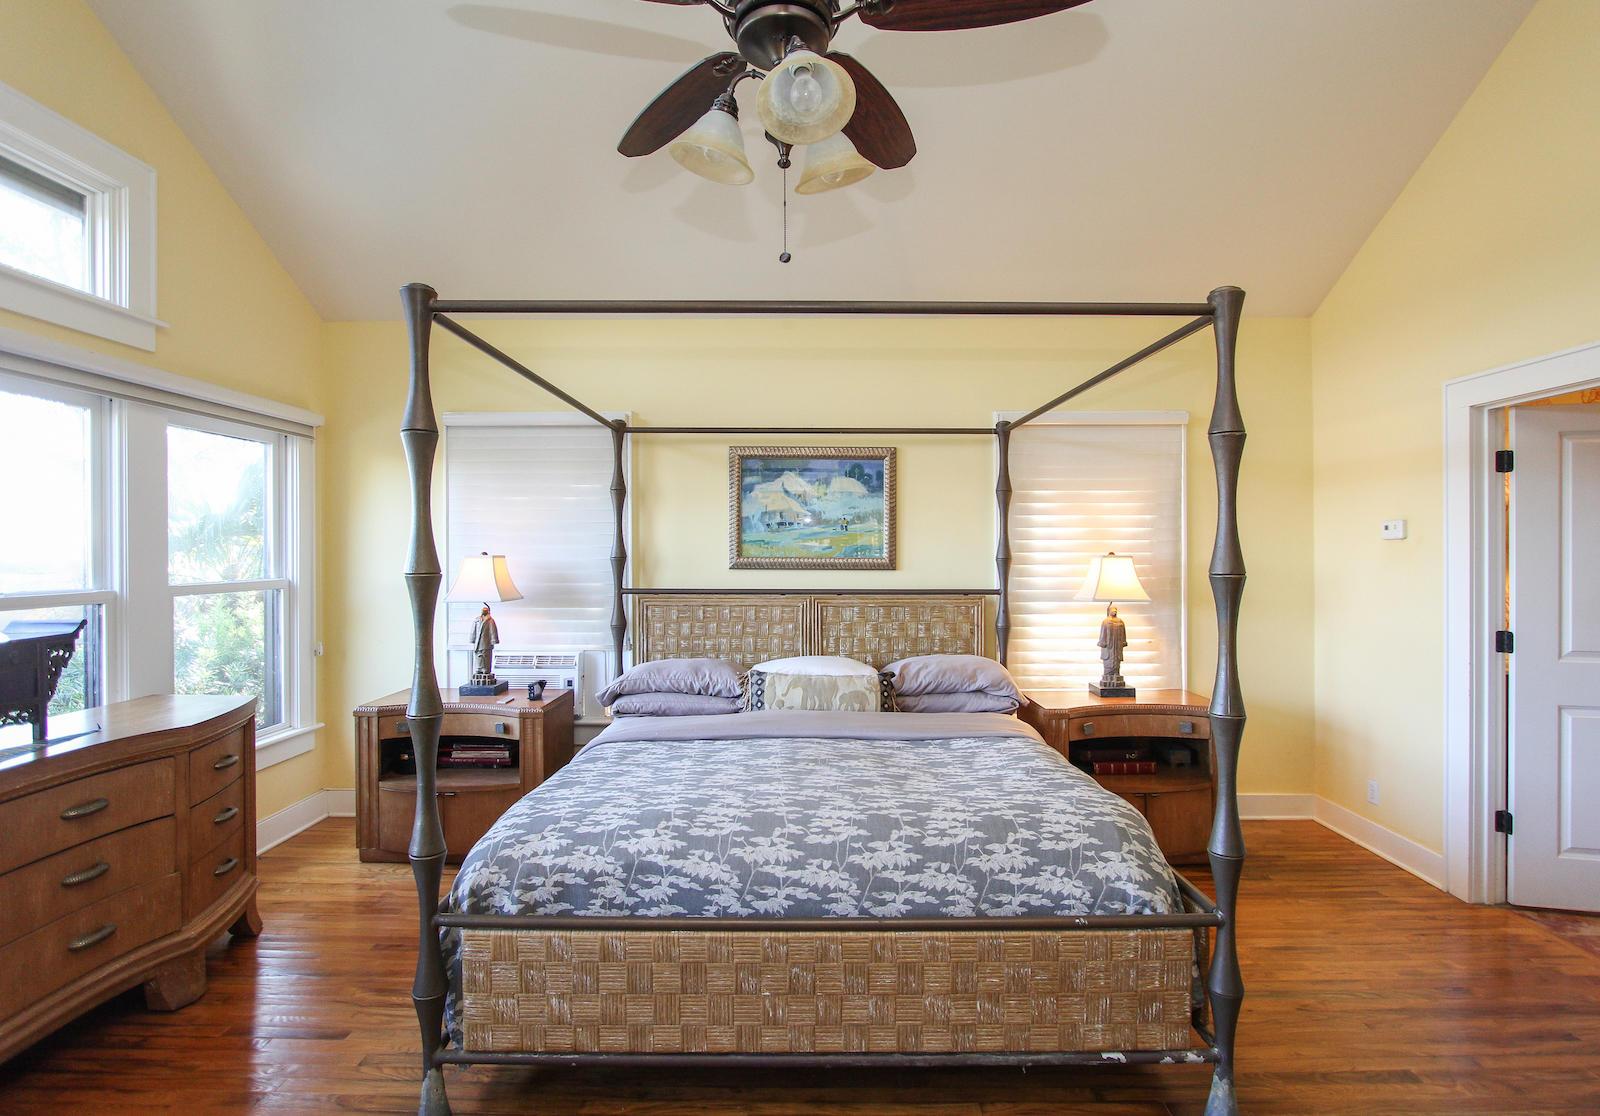 Albemarle Point Homes For Sale - 3 Albemarle, Charleston, SC - 12